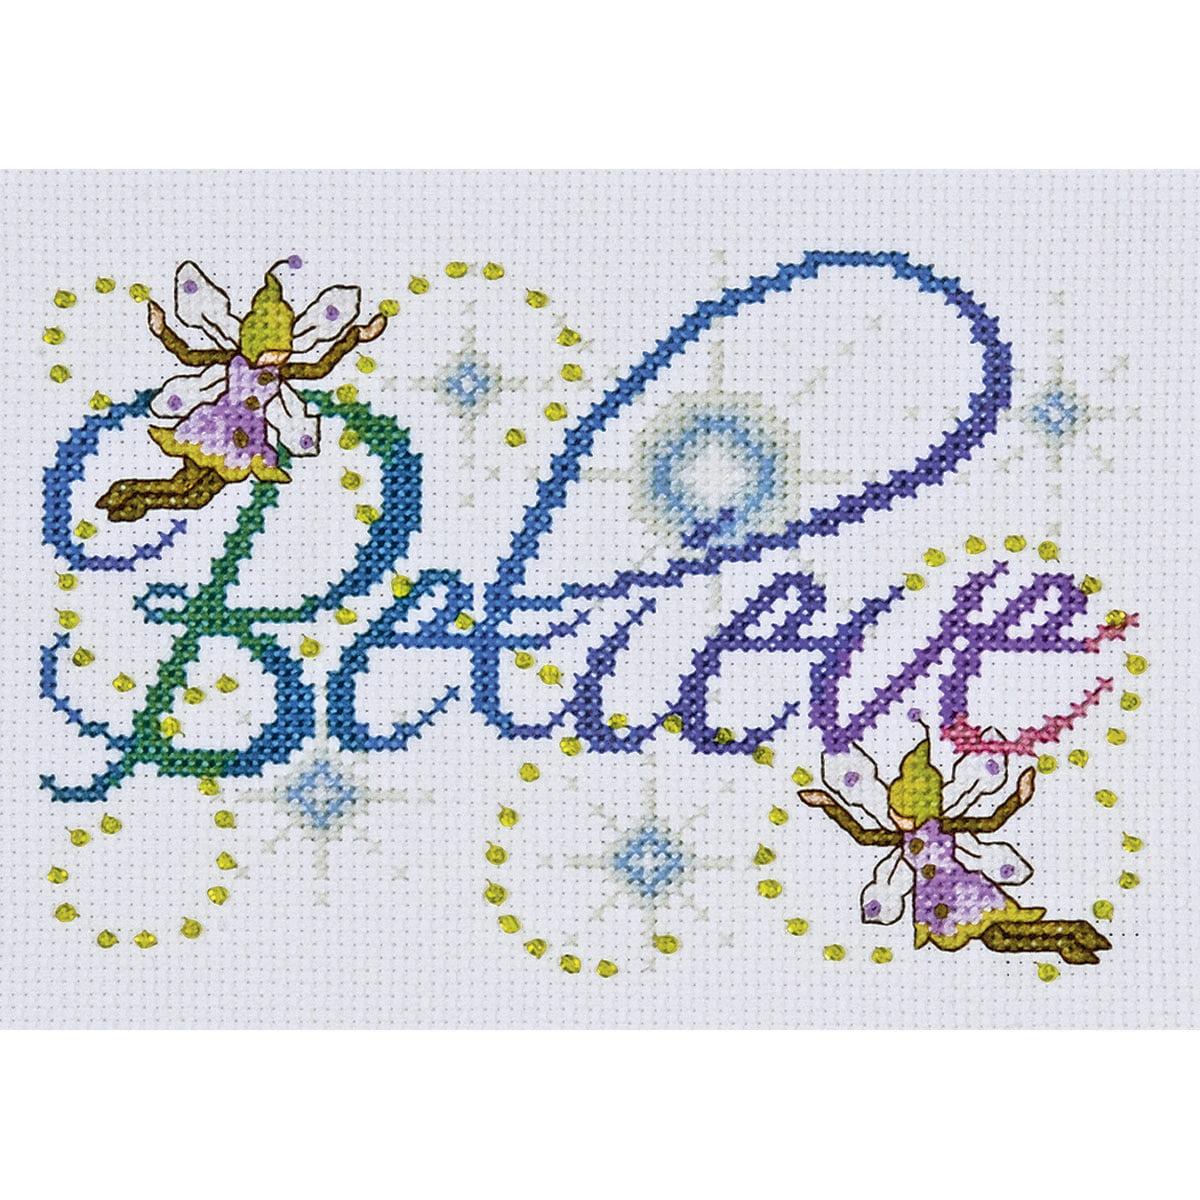 Tobin Design Works Counted Cross-Stitch Kit, Believe